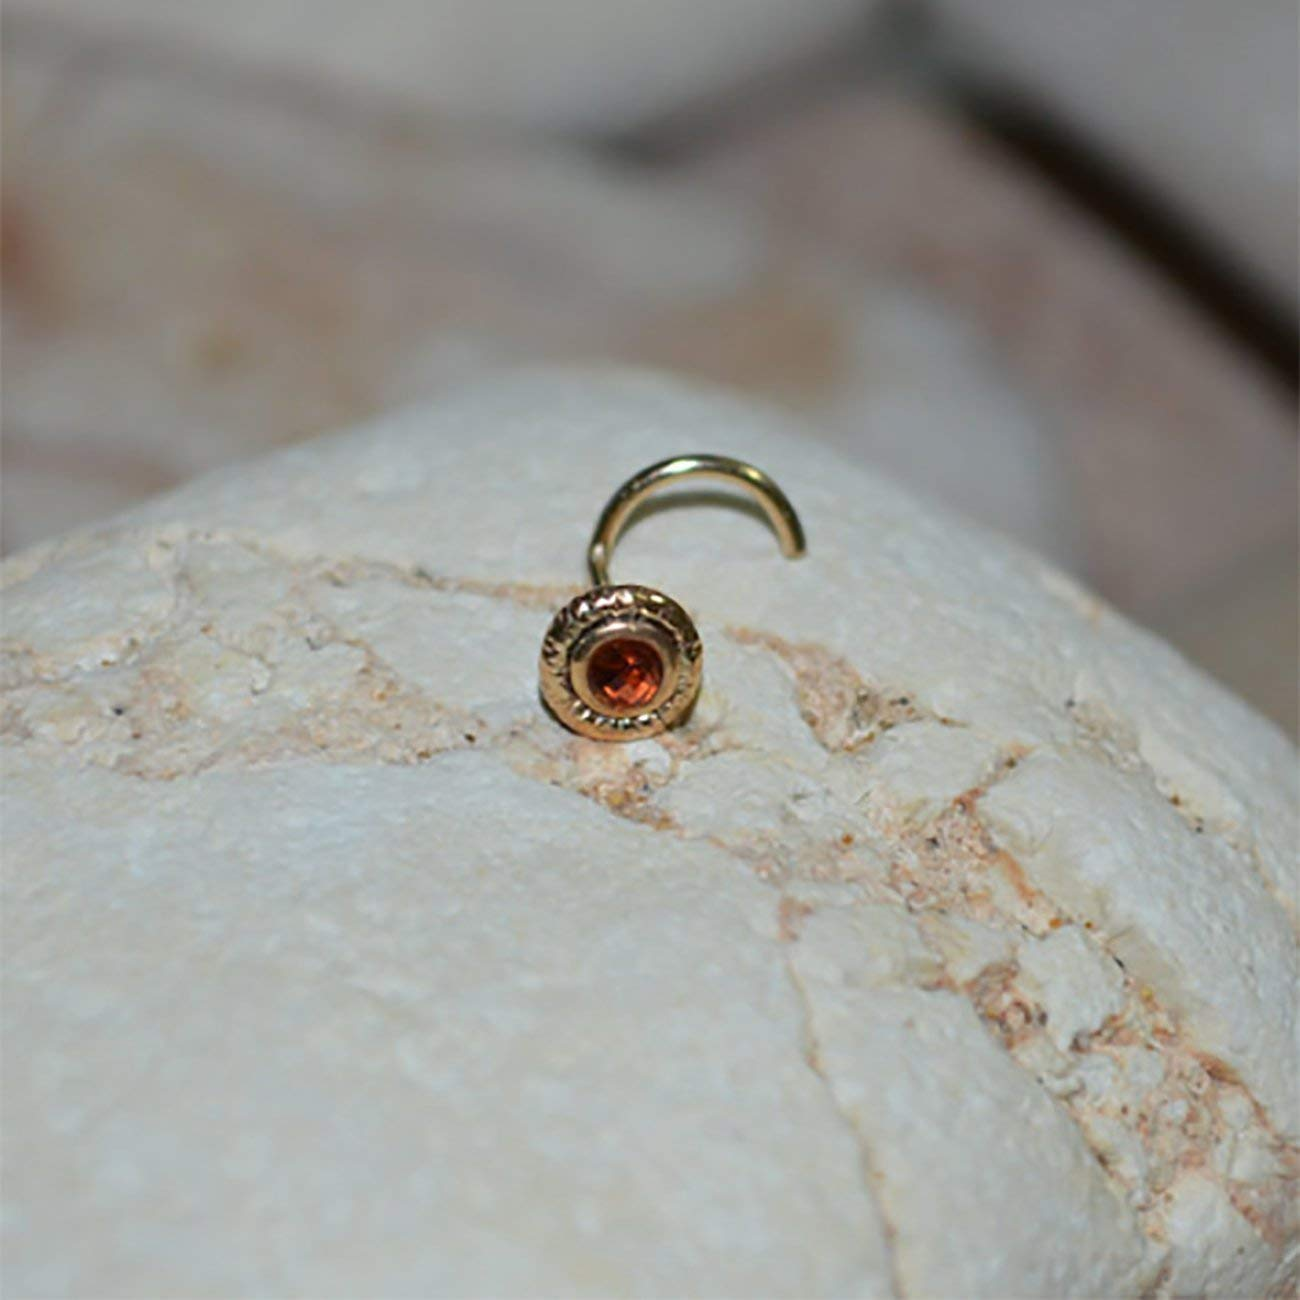 Helix Earring Stud Nose Ring Tragus Hoop Cartilage Stud Conch Stud Gold TRAGUS EARRING STUD //// 2mm Garnet Nose Stud 20 gauge